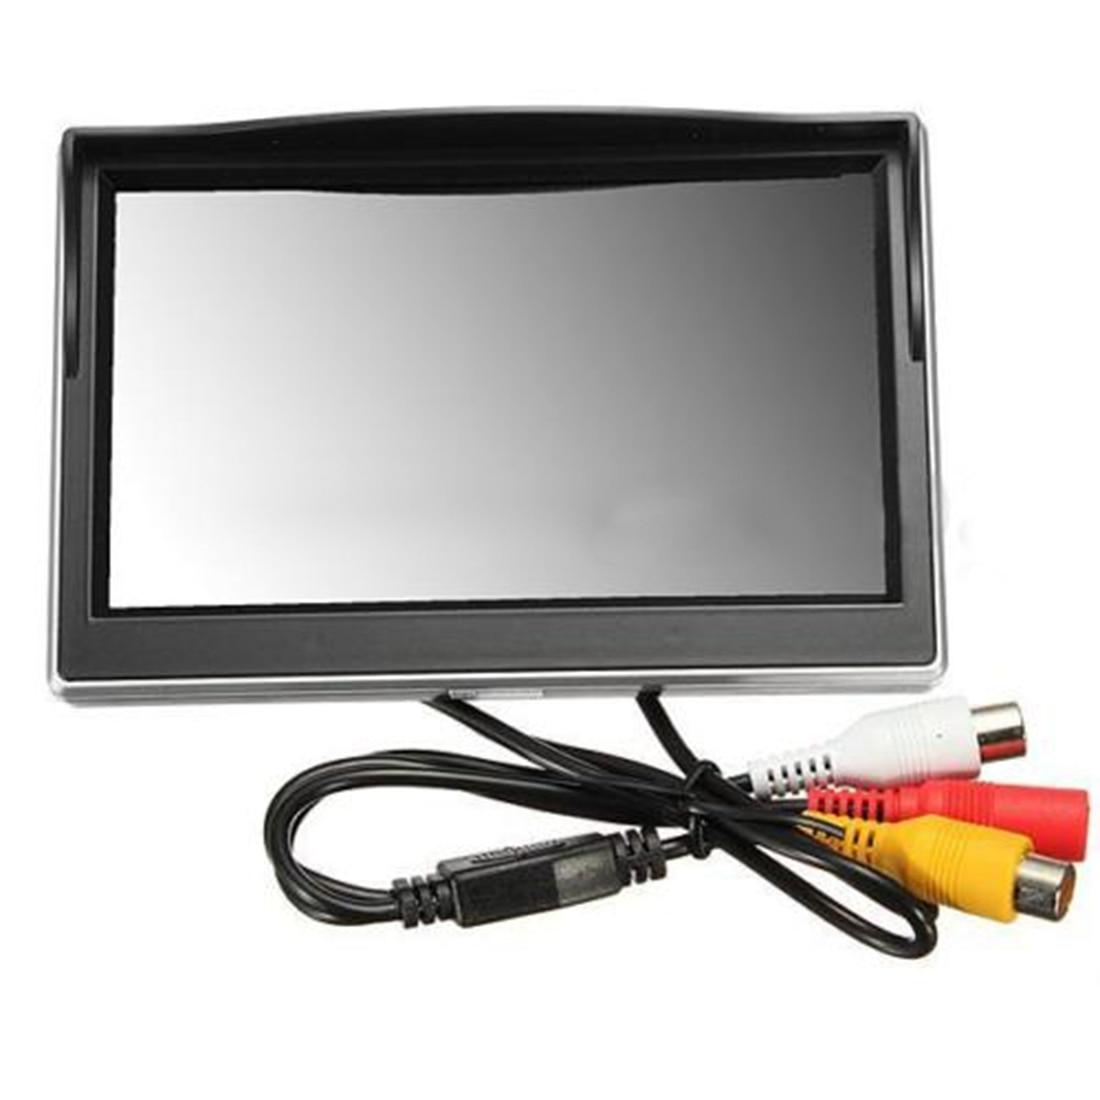 NEW 5 800*480 TFT LCD HD Screen Monitor for Car Rear Rearview Backup Camera